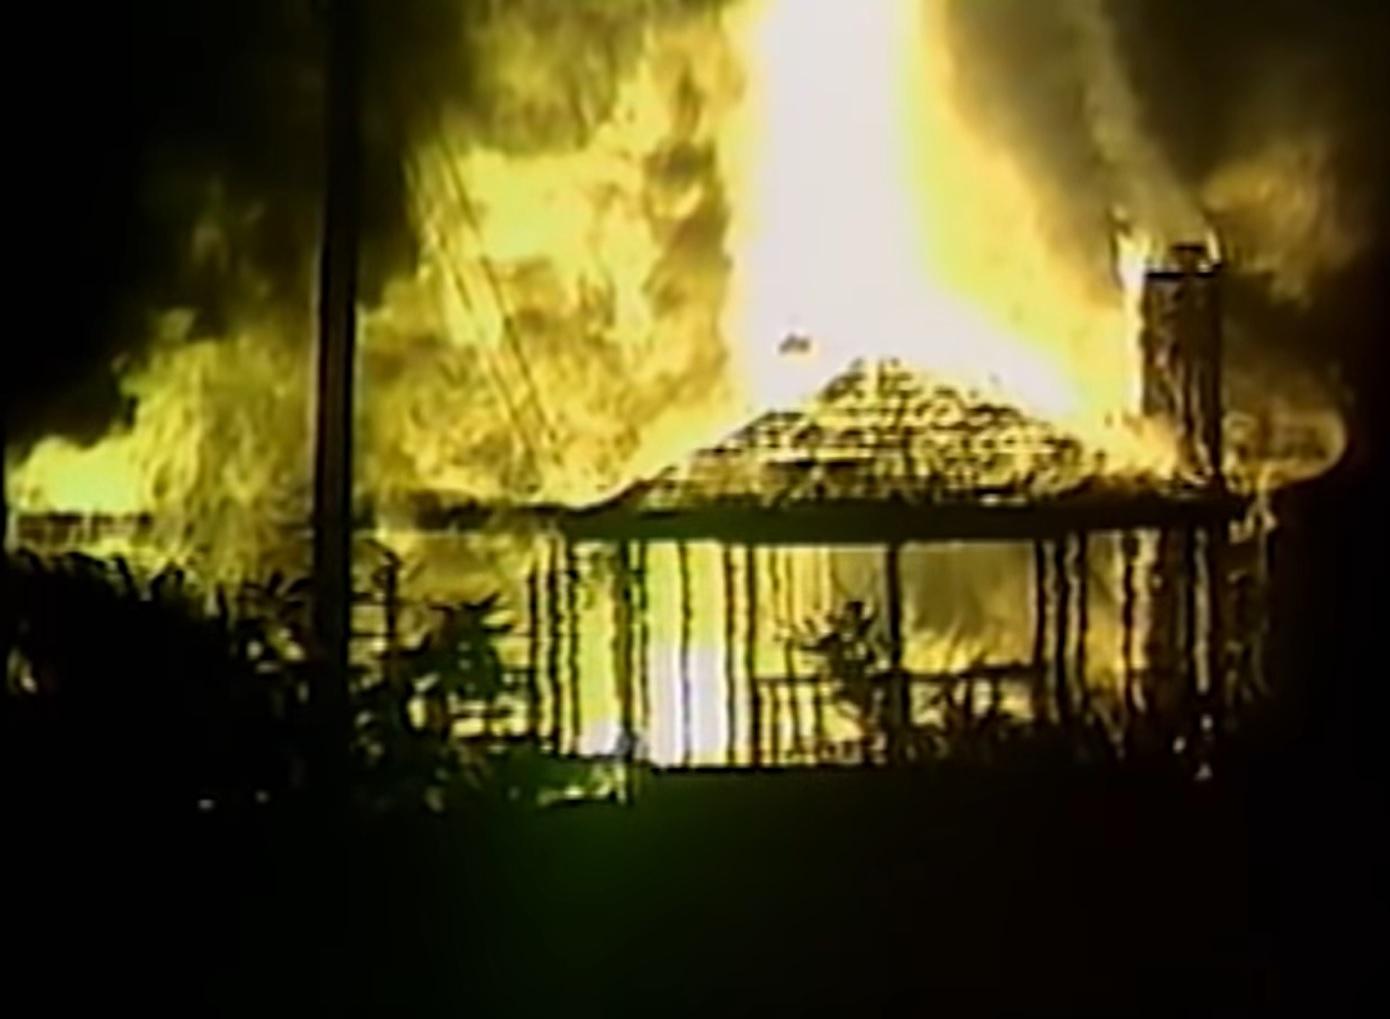 Stockton arsonist1